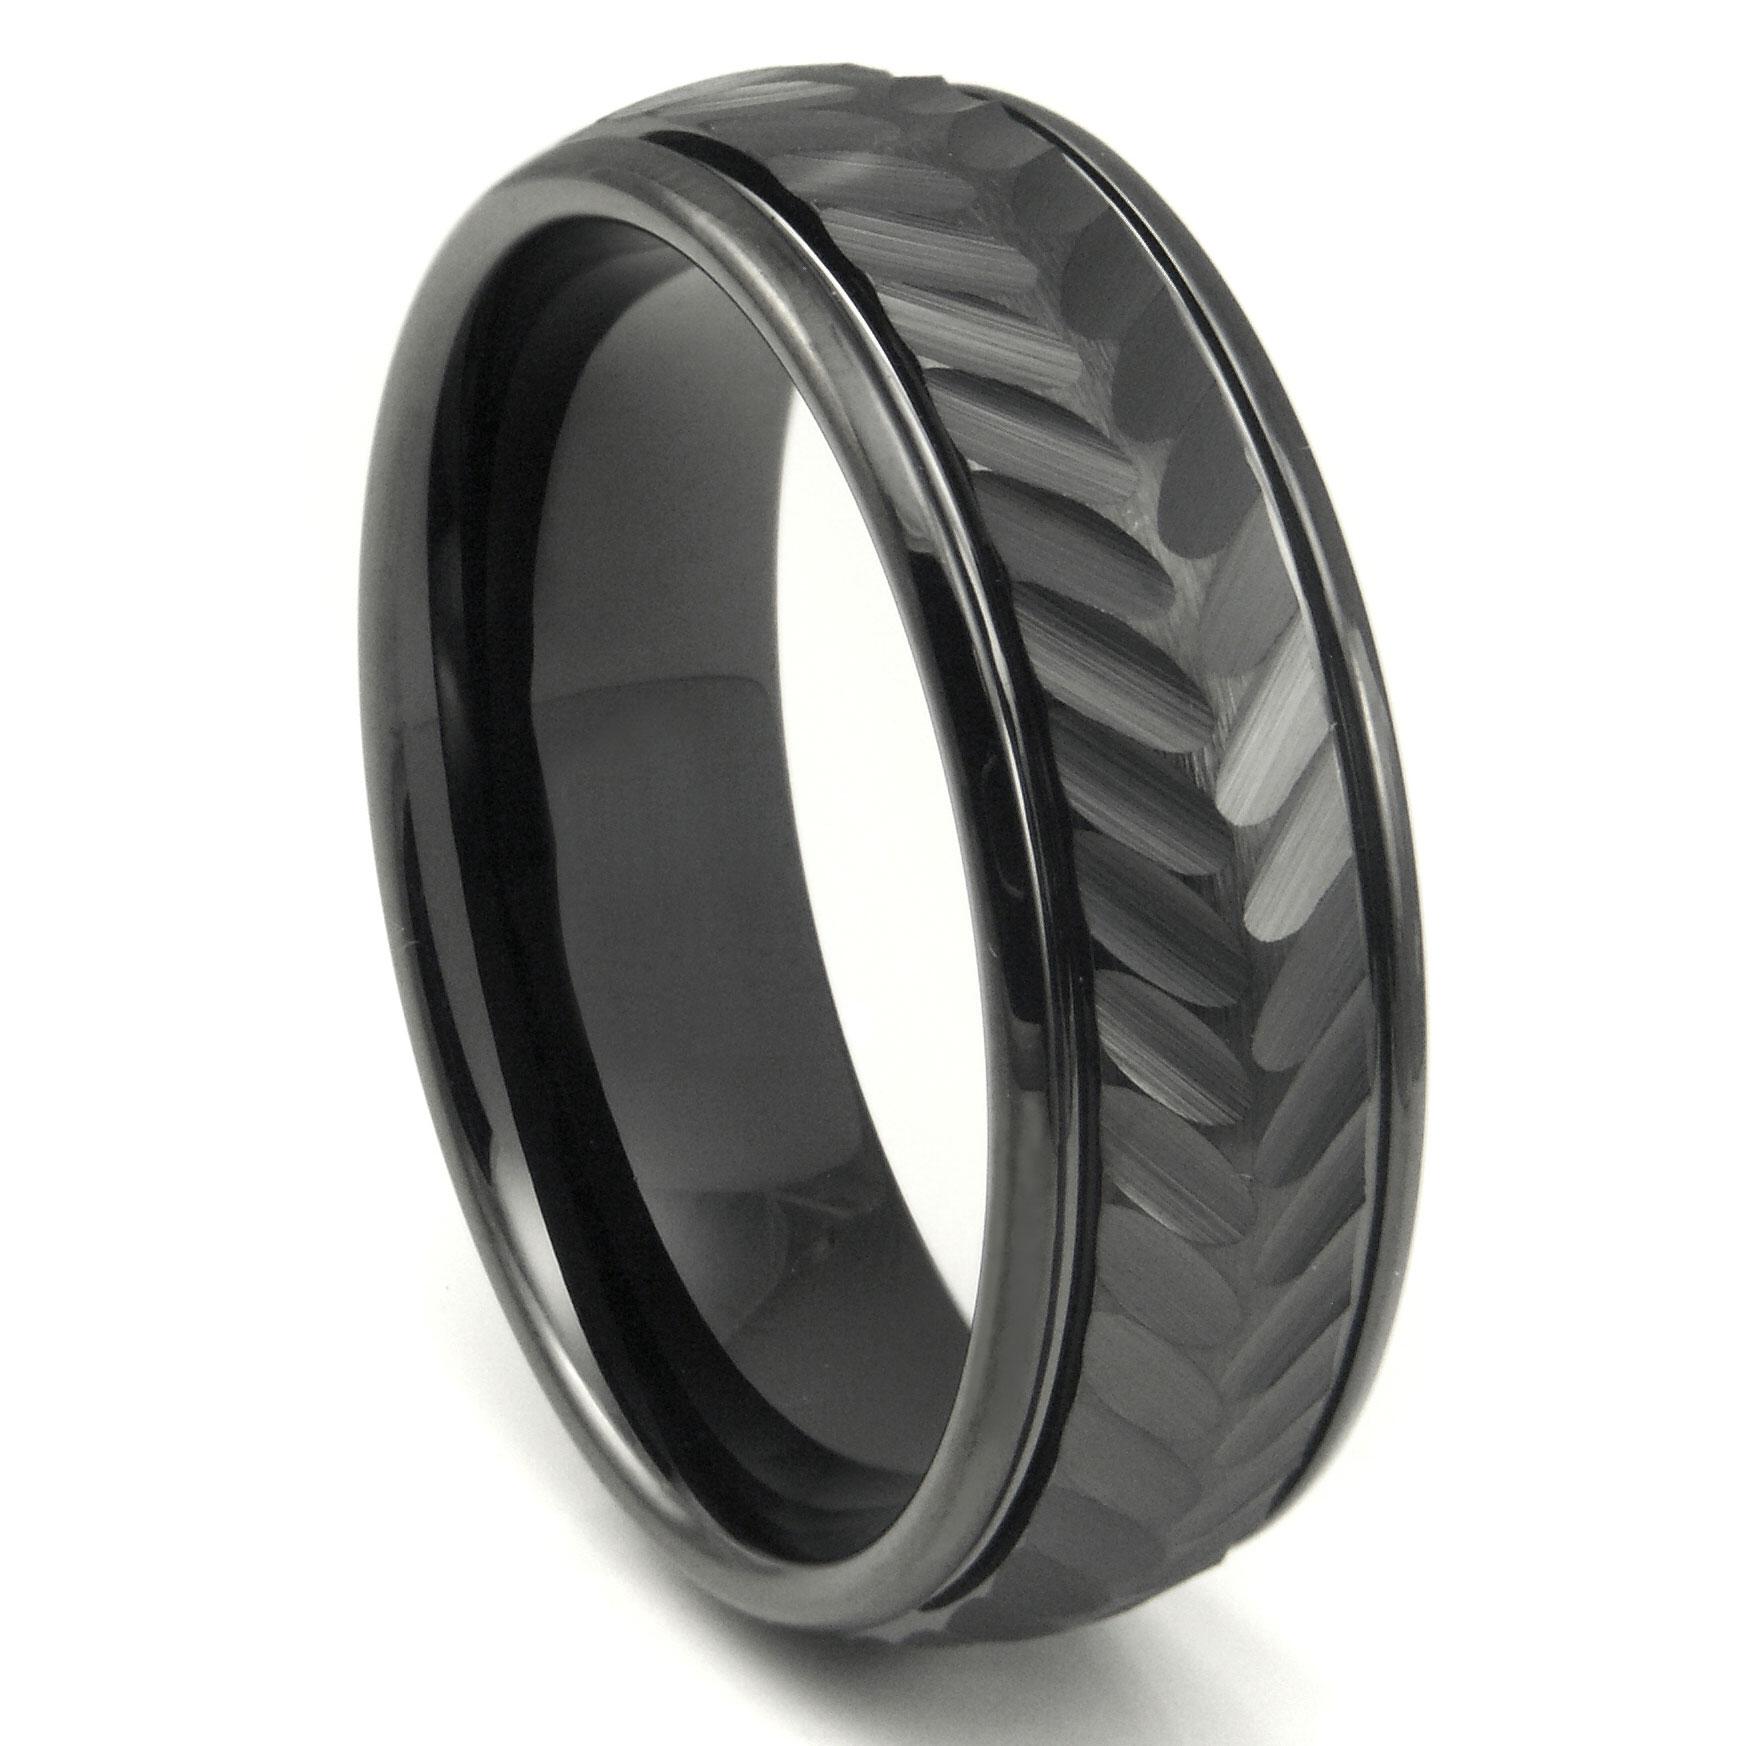 Black Tungsten Carbide 8MM Chevron Newport Wedding Band Ring P tungsten carbide wedding band Home Men s Tungsten Carbide Rings Loading zoom